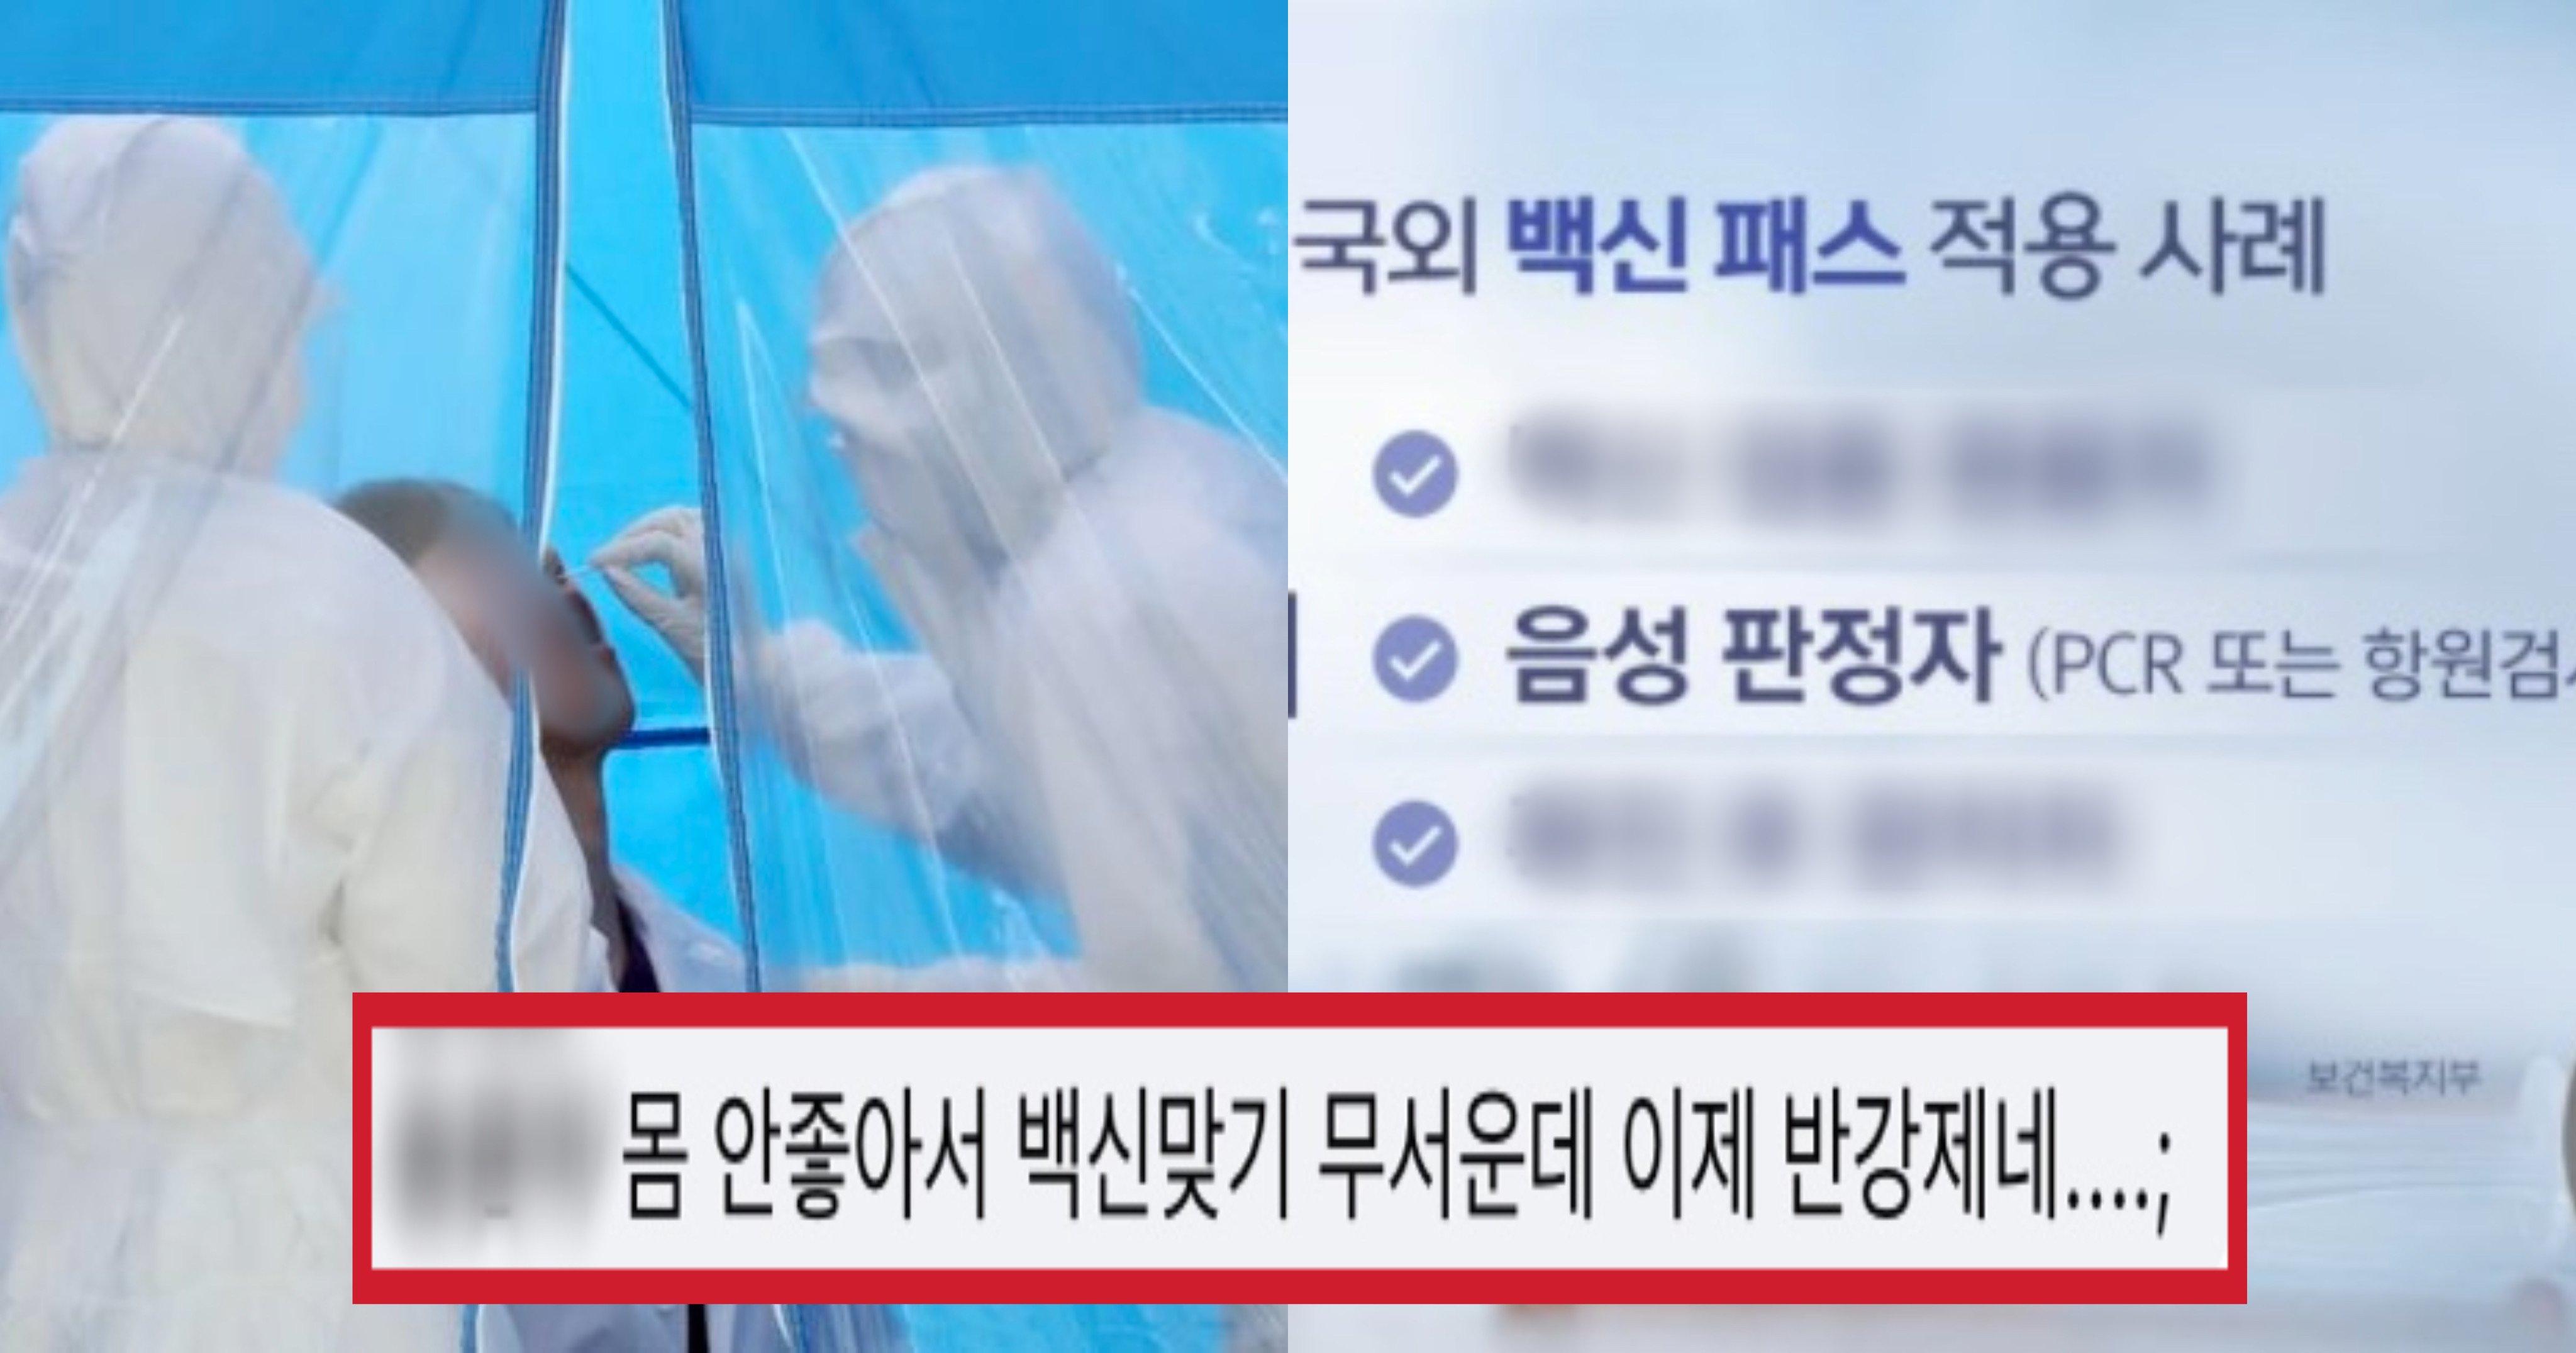 "2ffb722b e5bb 4204 8f99 6c86b3712441.jpeg?resize=412,232 - ""이 사람들은 백신패스입니다"" 방금 MBC 뉴스에 나온 국내 '백신패스' 검토 논의"